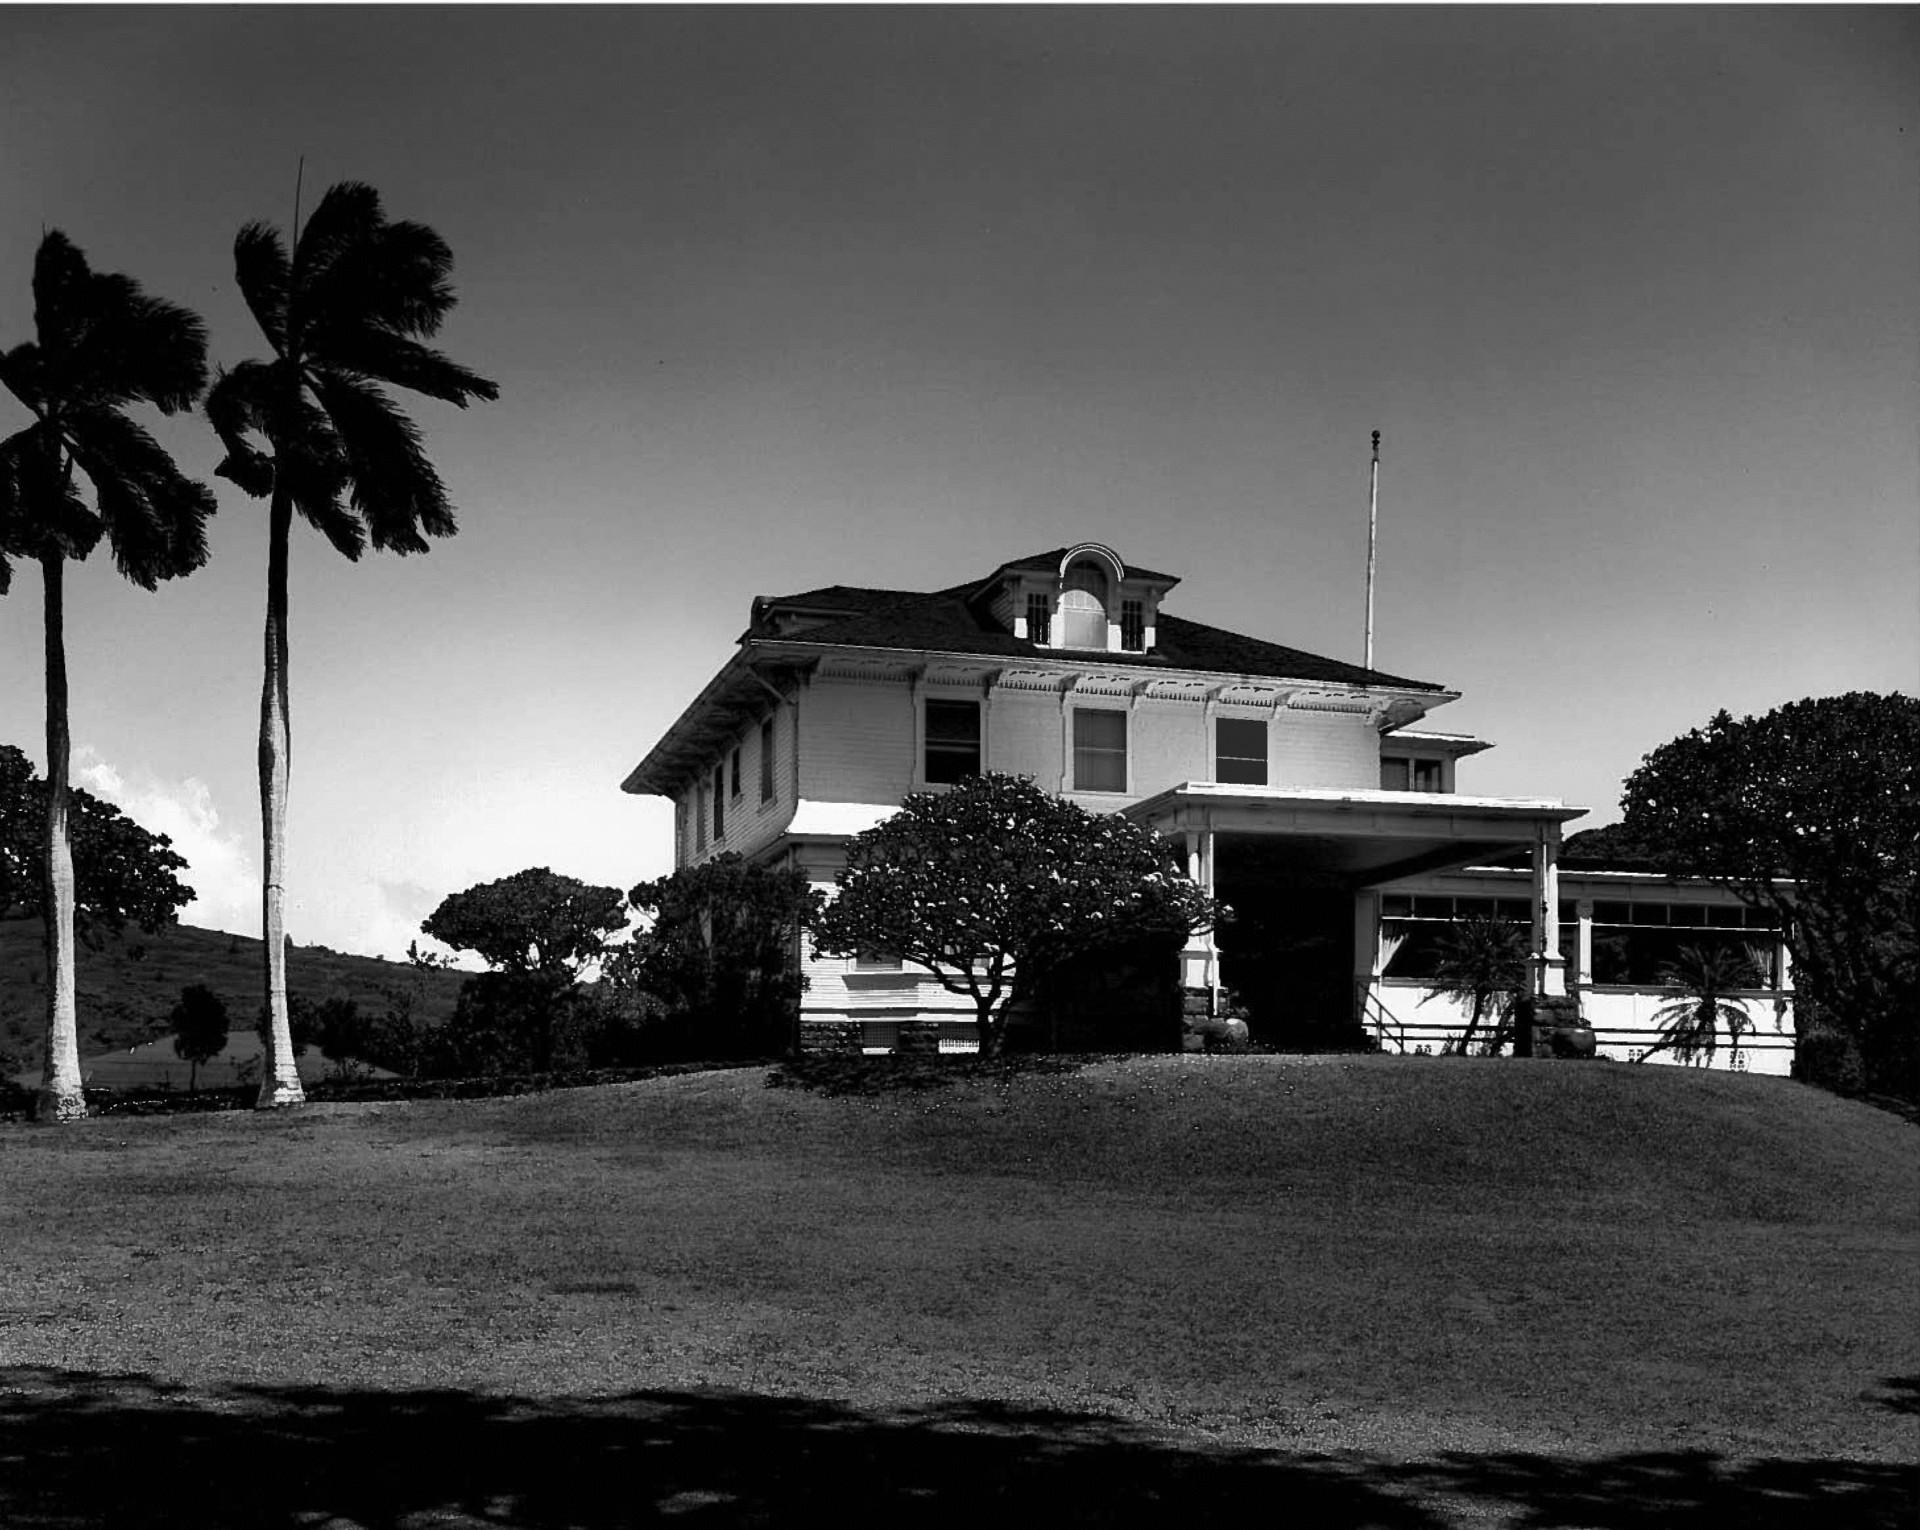 2234 Kamehameha Avenue/ Frank C. Atherton House